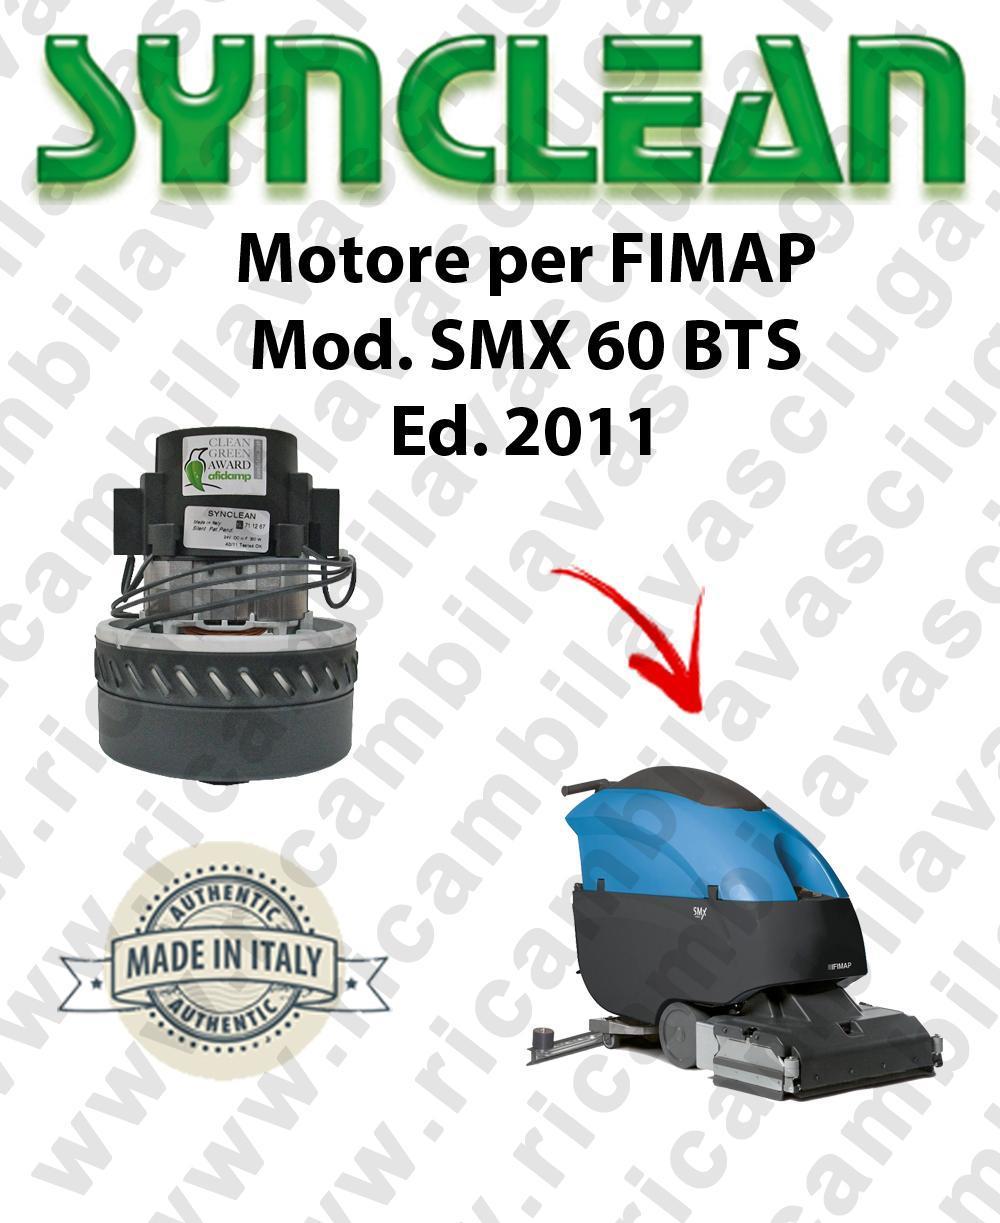 SMX 60 BTS Ed. 2011 Vacuum motor LAMB AMETEK scrubber dryer FIMAP